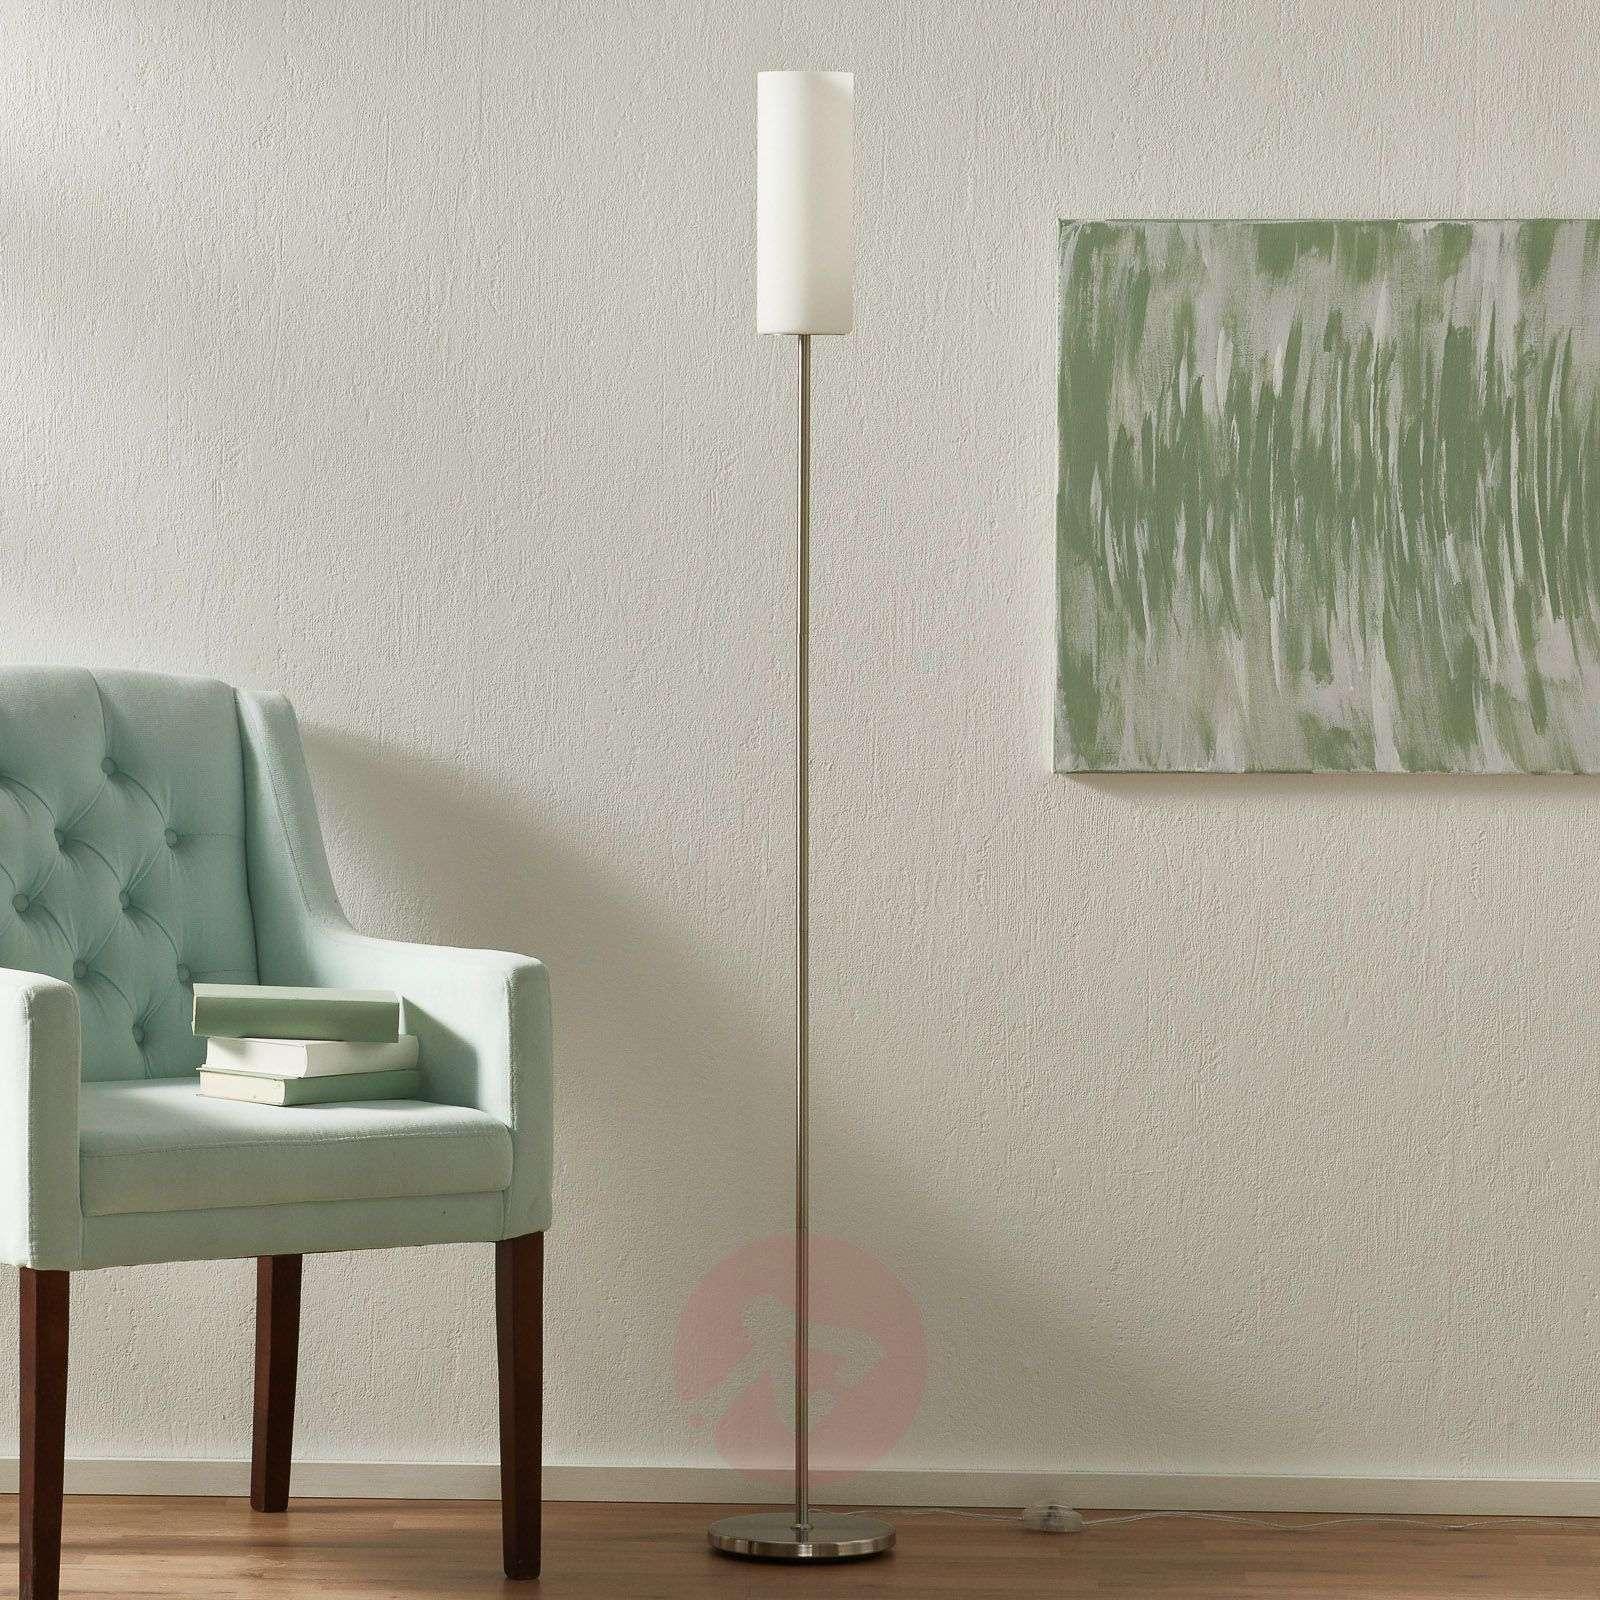 TROY Graceful Floor Lamp in White-3031194-01